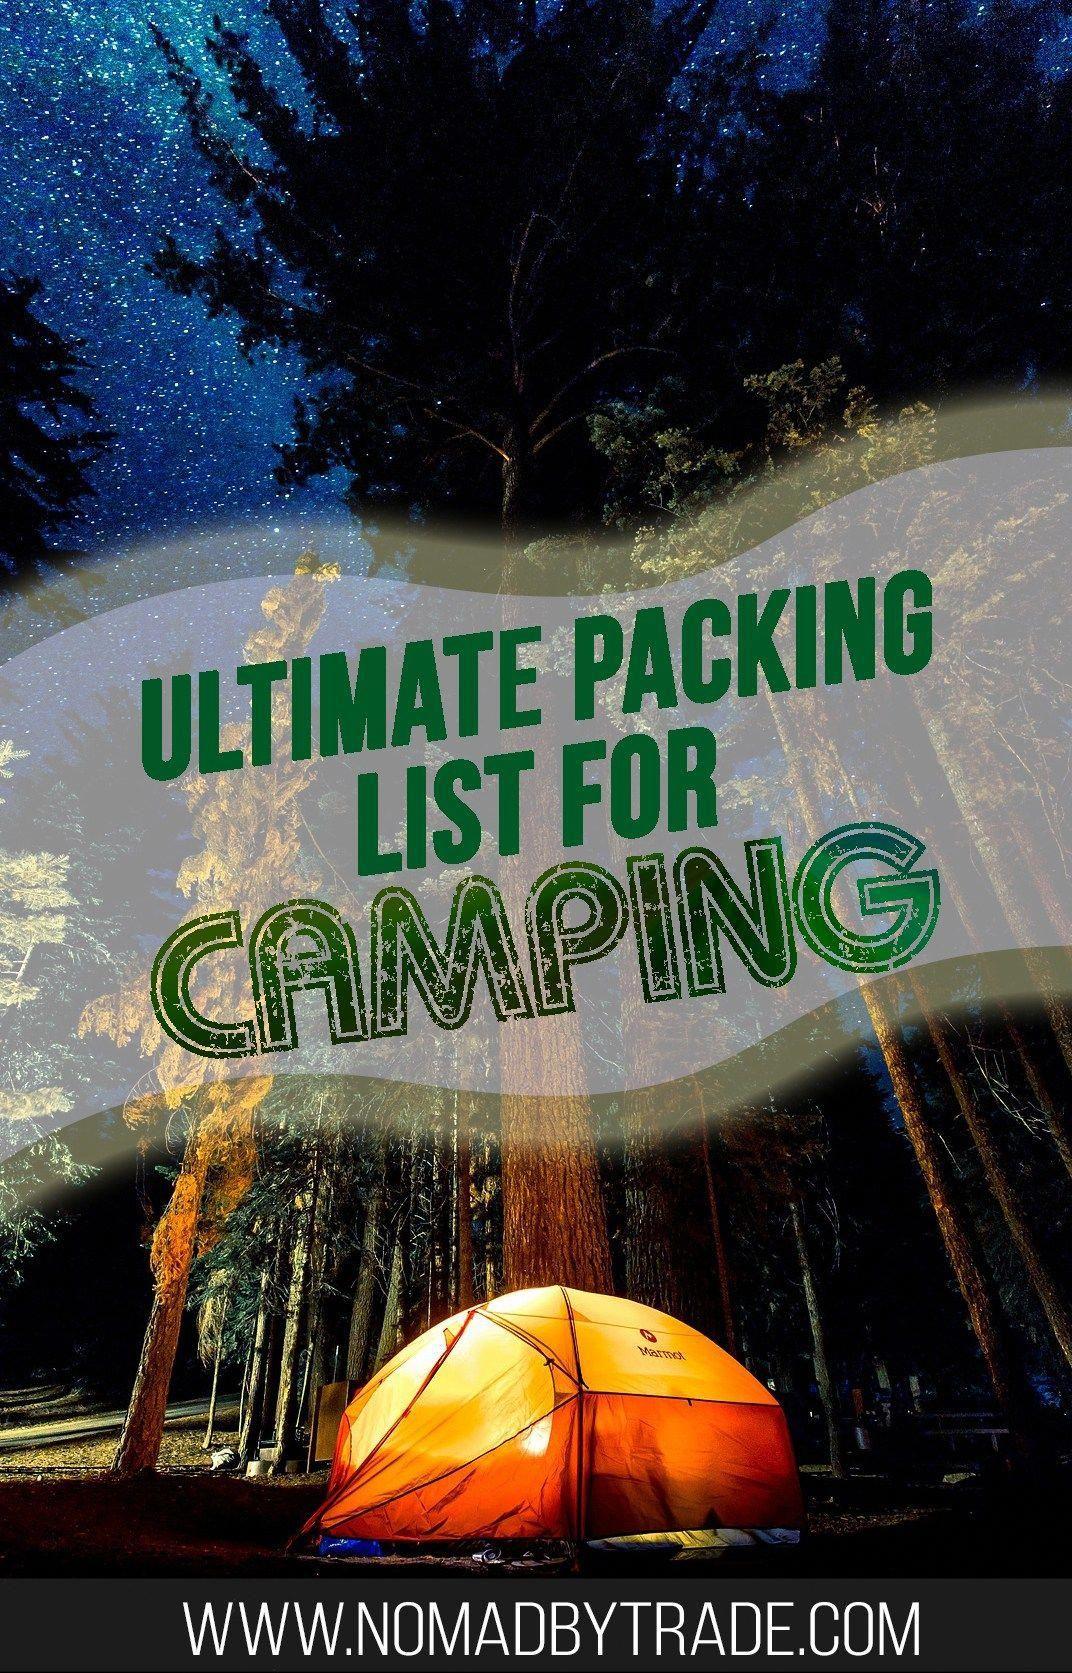 Tent Camping Store Near Me Camping Near Me Nj #campingworld